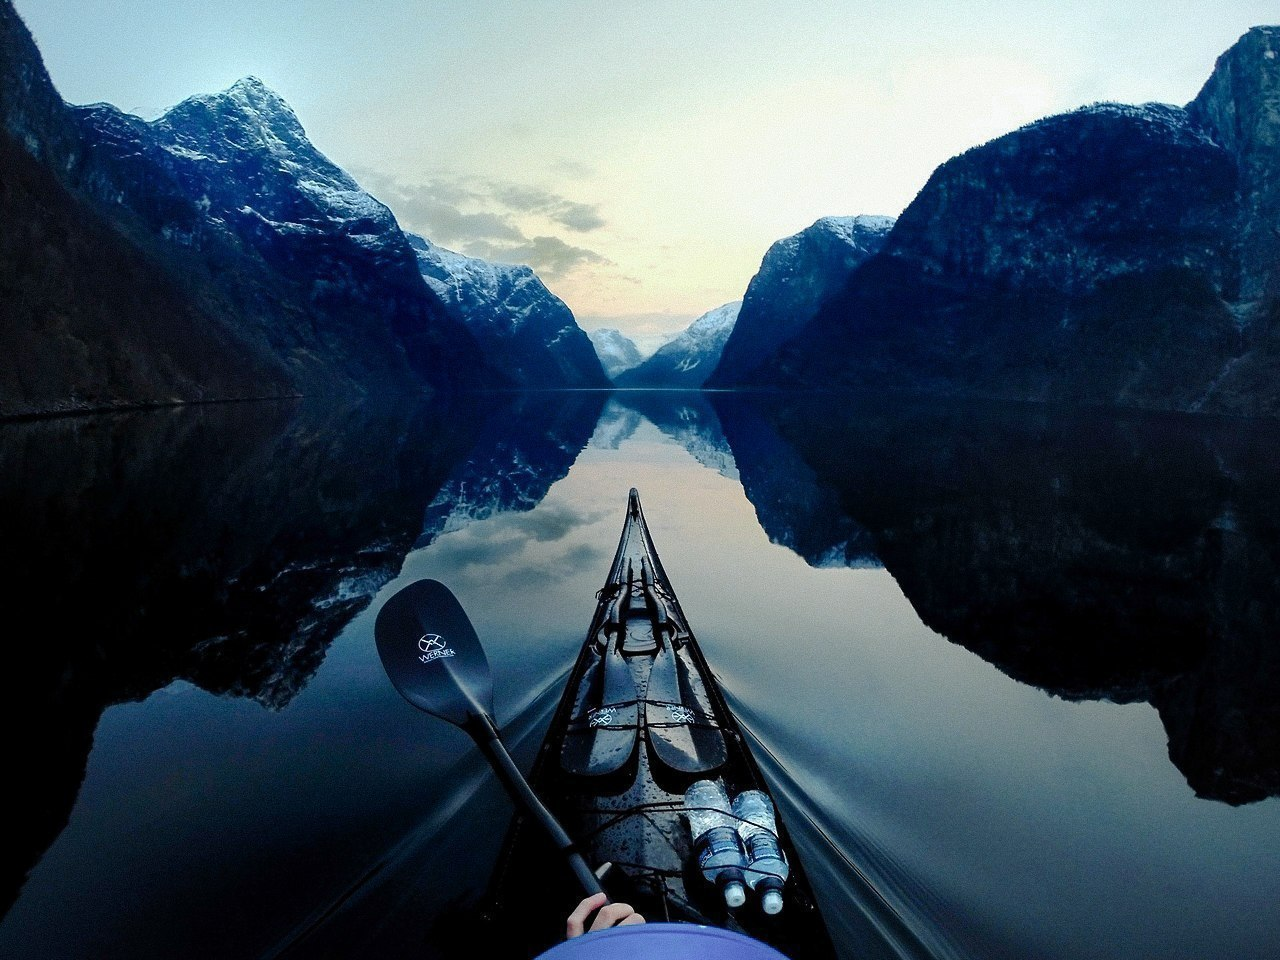 v2stbRAOj60 - Норвегия - страна холодной красоты